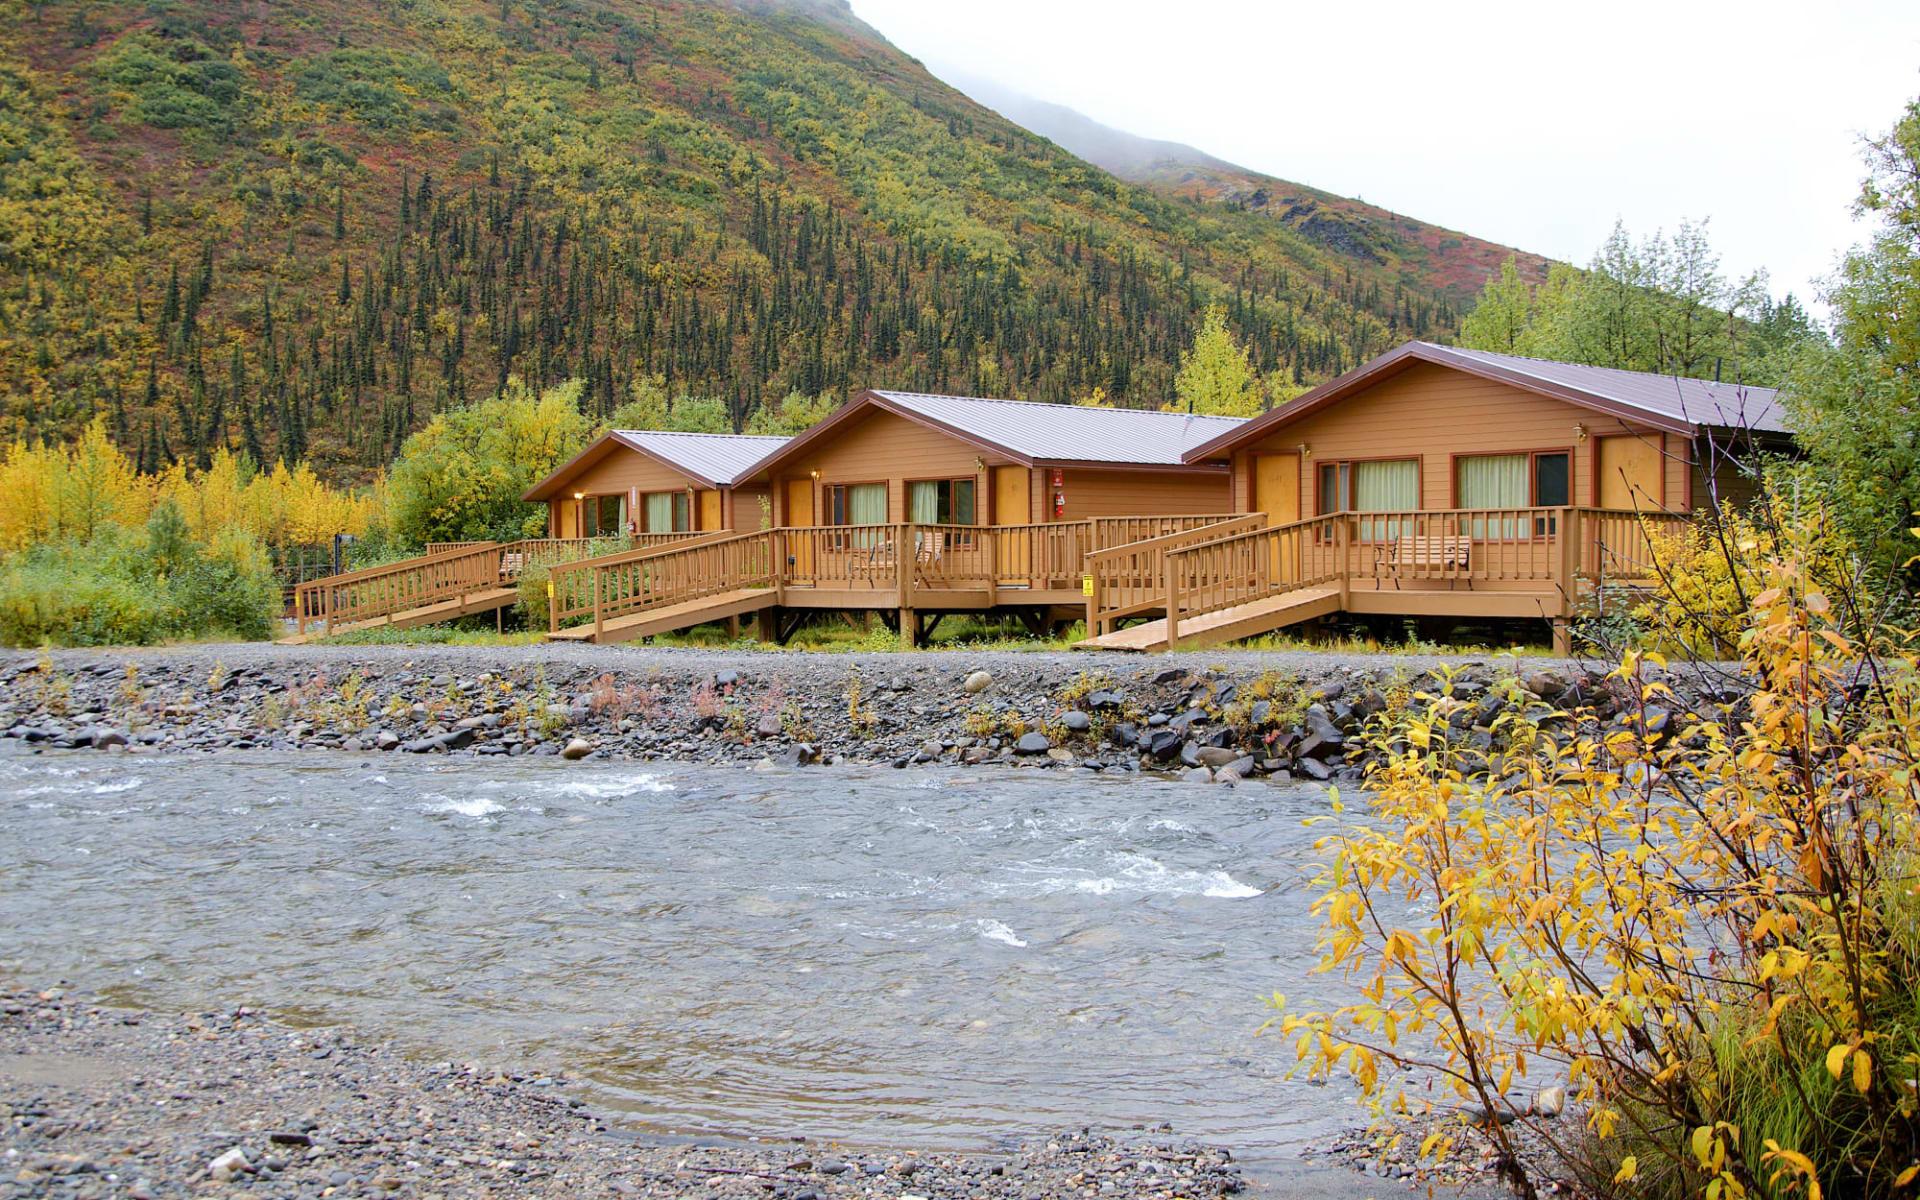 Denali Backcountry Lodge in Denali National Park: denali_backcountry_lodge_DBL Cabins